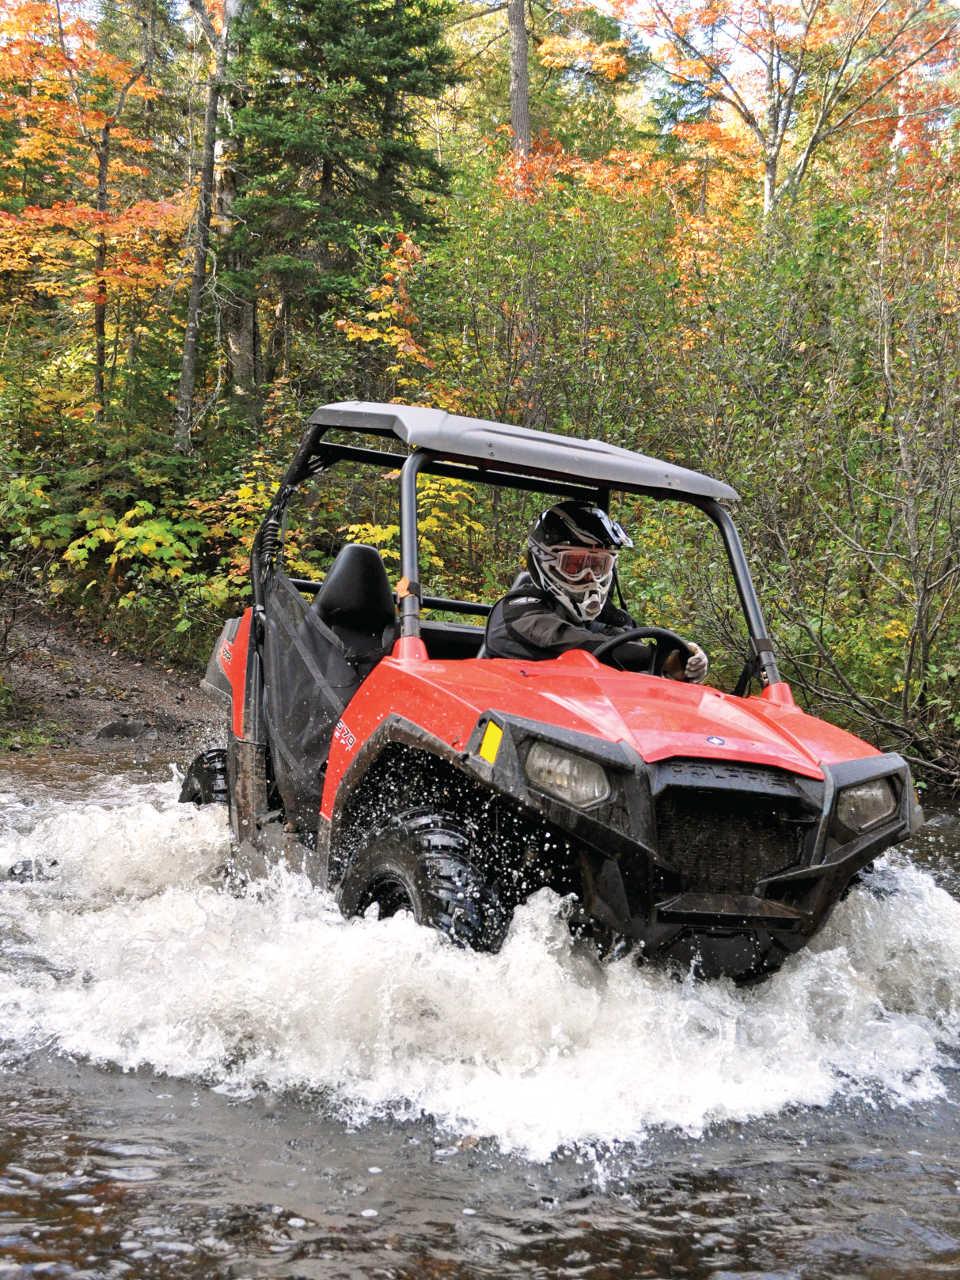 North Country Rivers ATV Resort